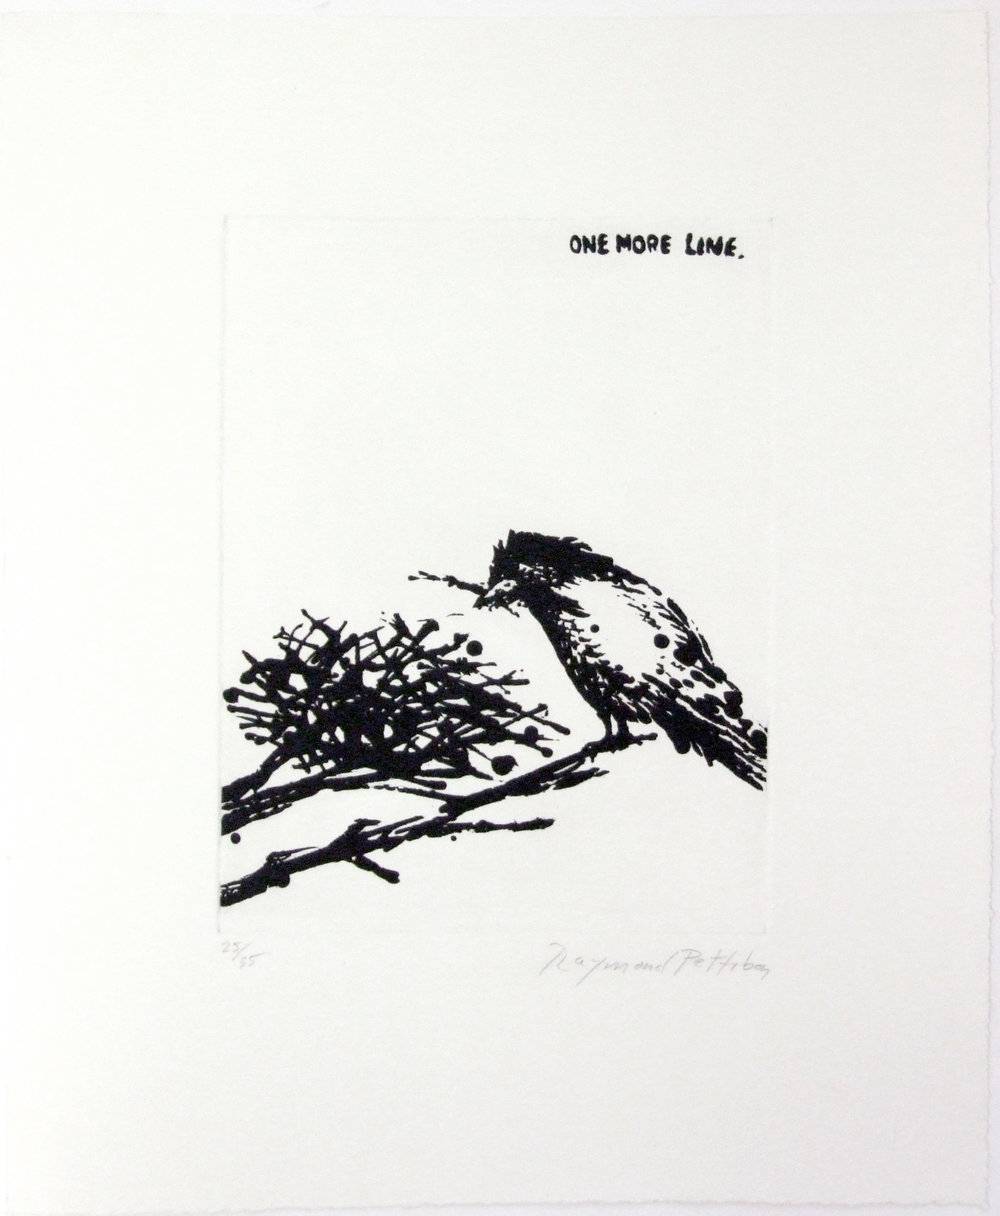 Prints by Raymond Pettibon